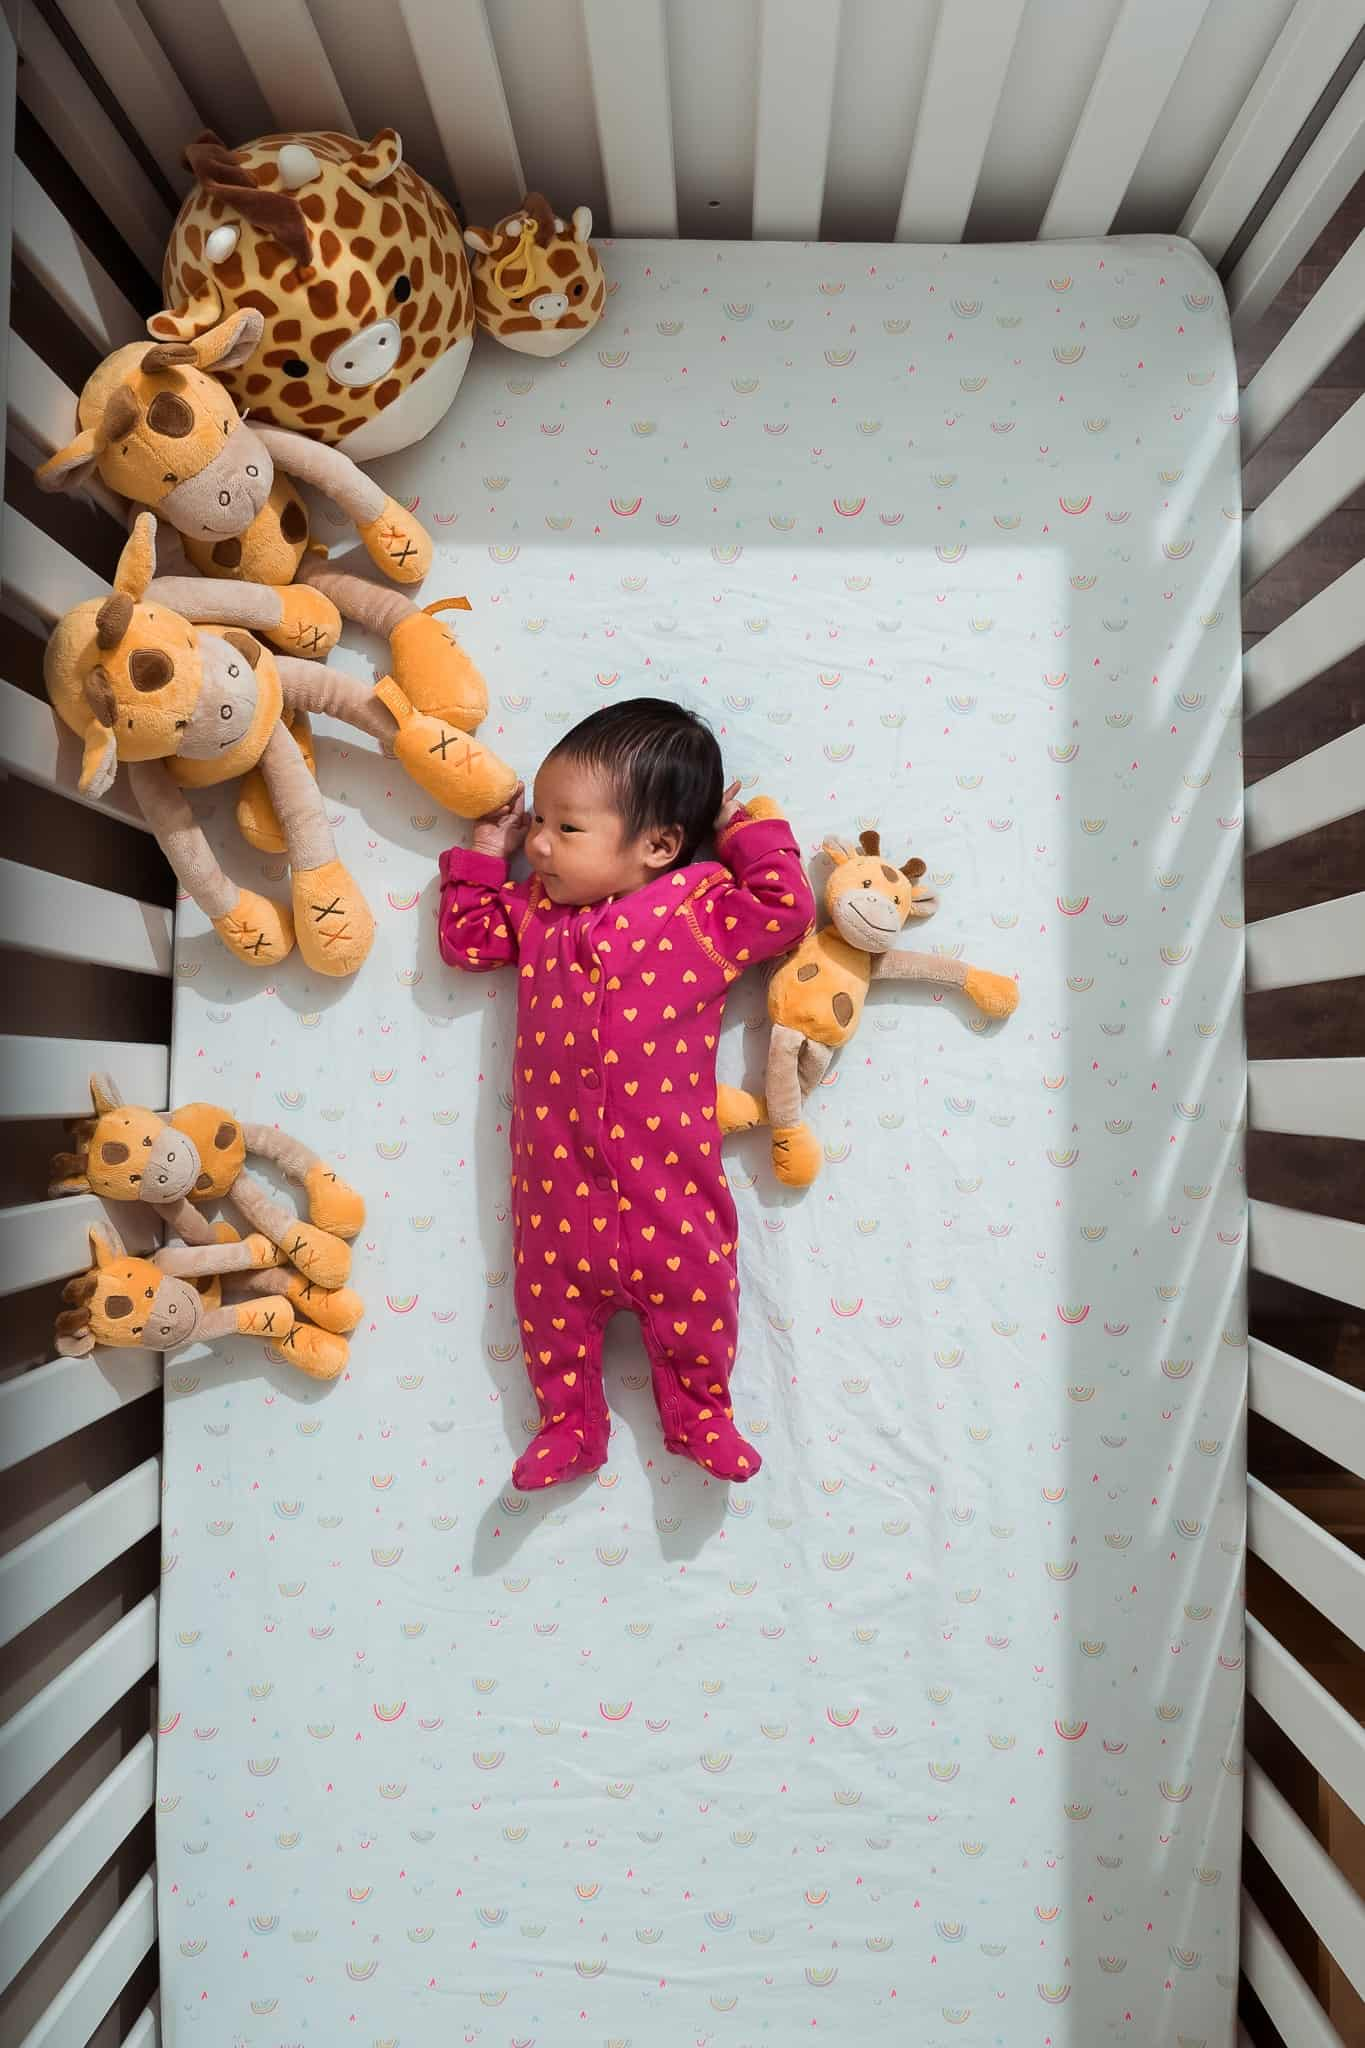 newborn baby in crib with stuffed giraffes